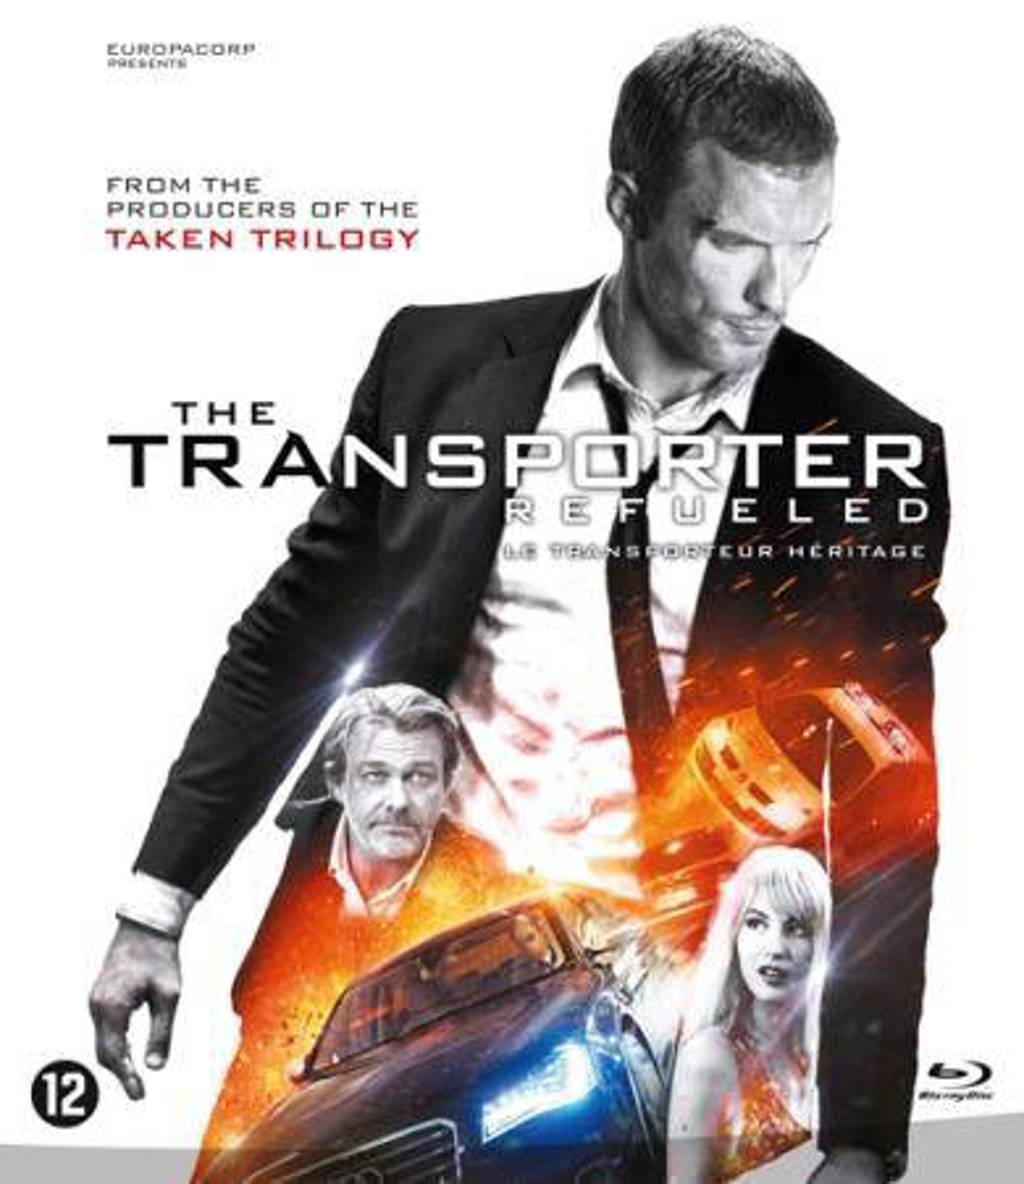 Transporter refueled (Blu-ray)